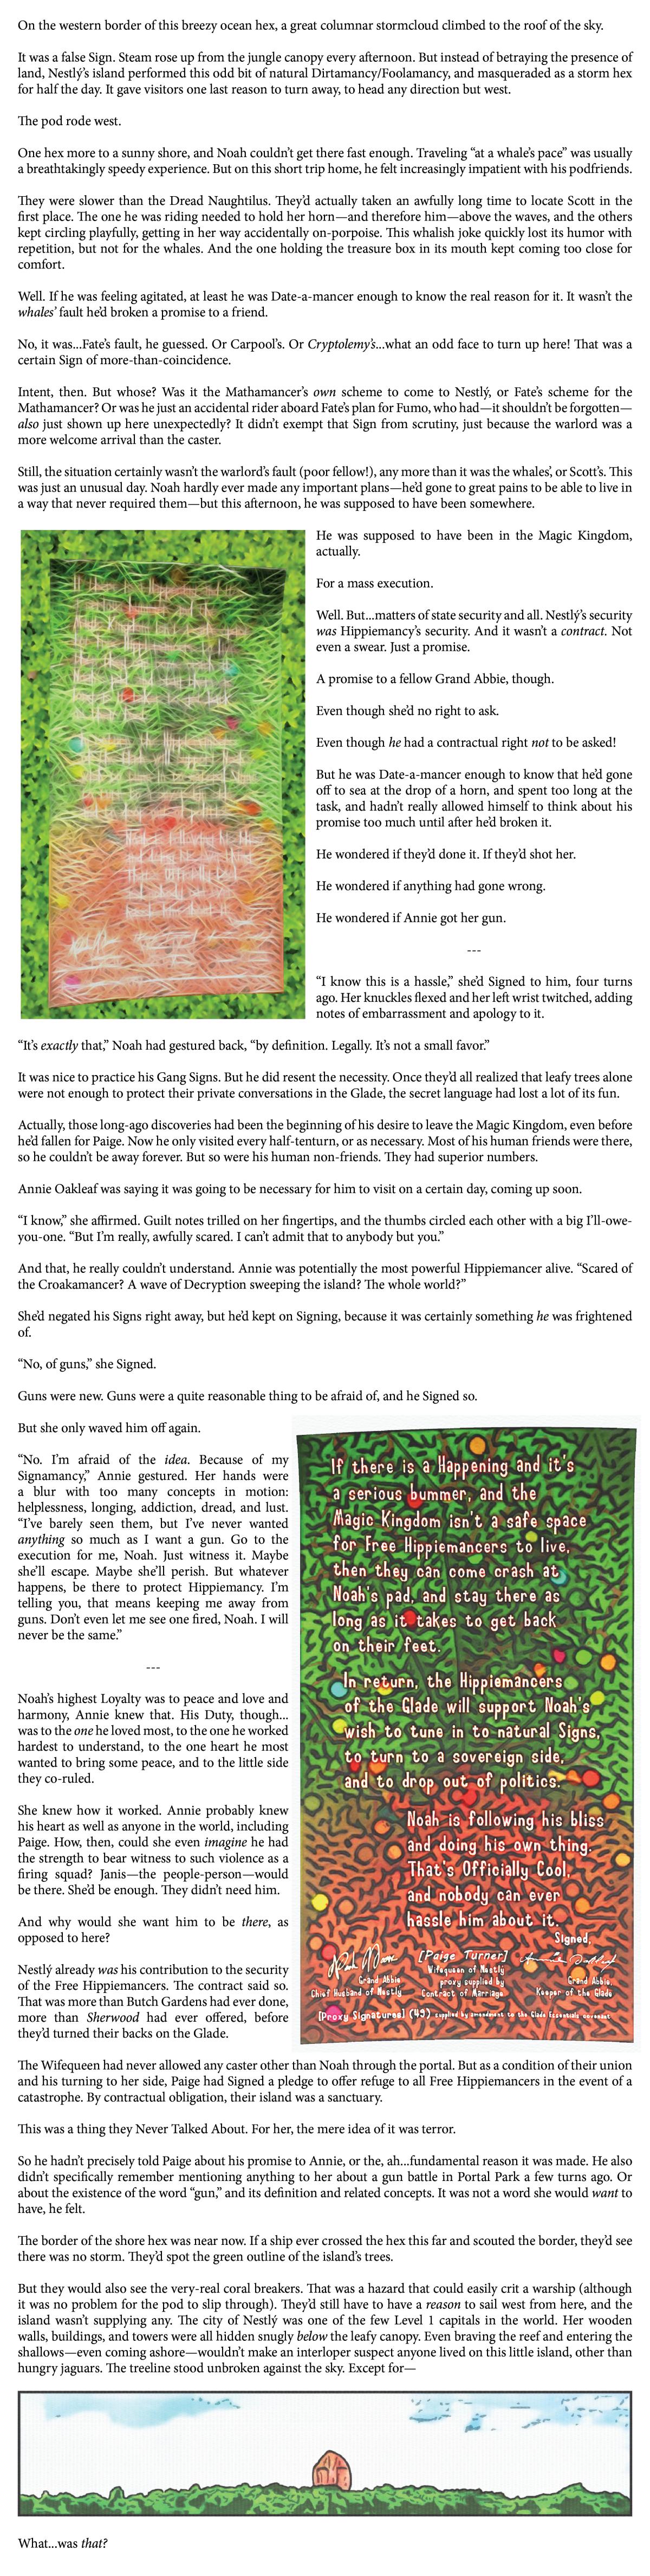 Comic - Book 5 - Page 17